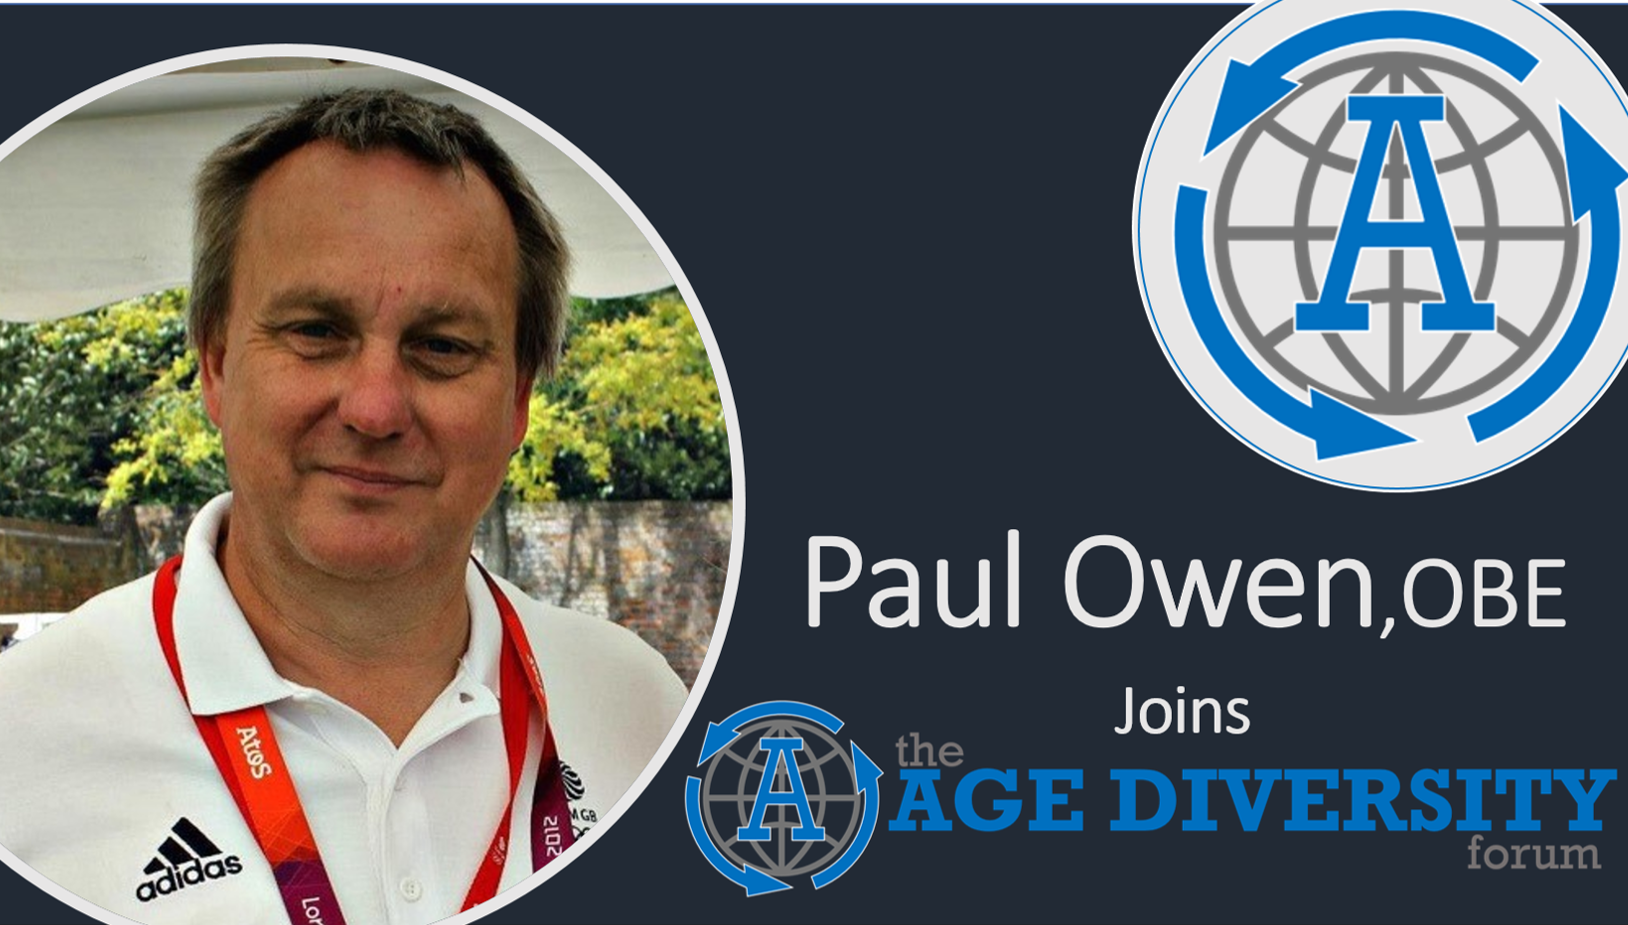 The Age Diversity Forum